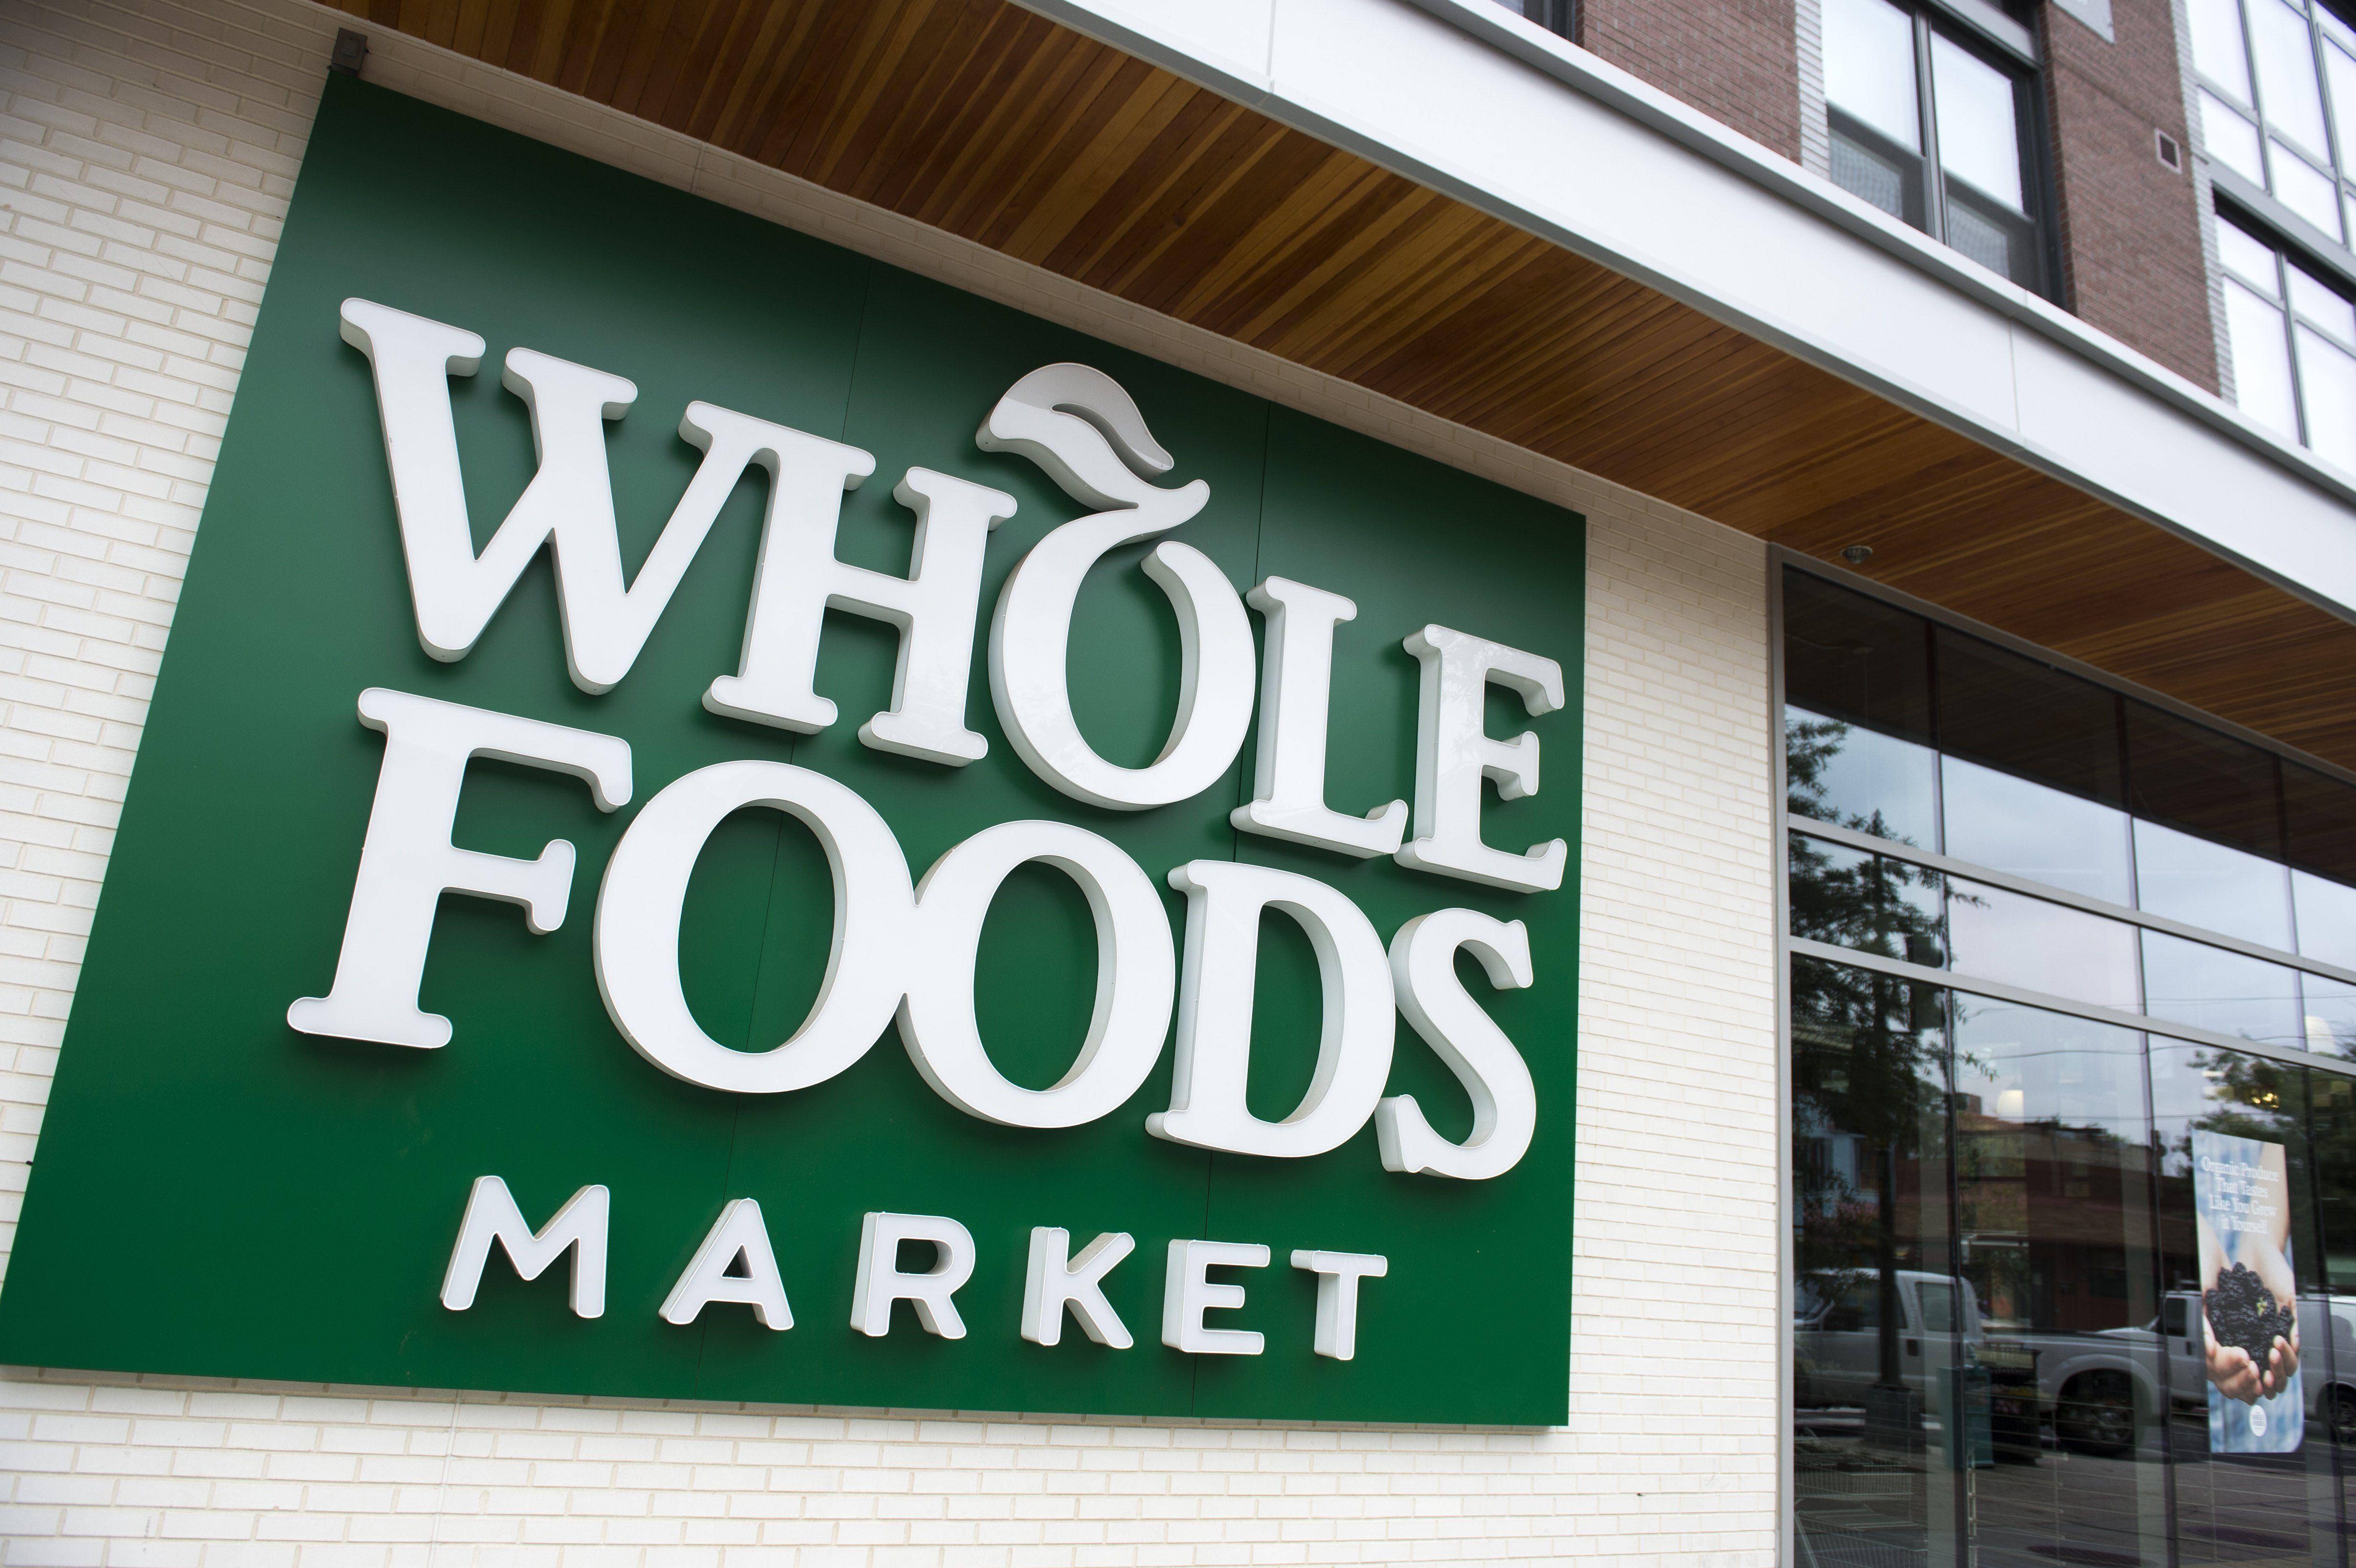 Detroit Whole Foods Market store shoppers should monitor for COVID-19 symptoms - Detroit Free Press